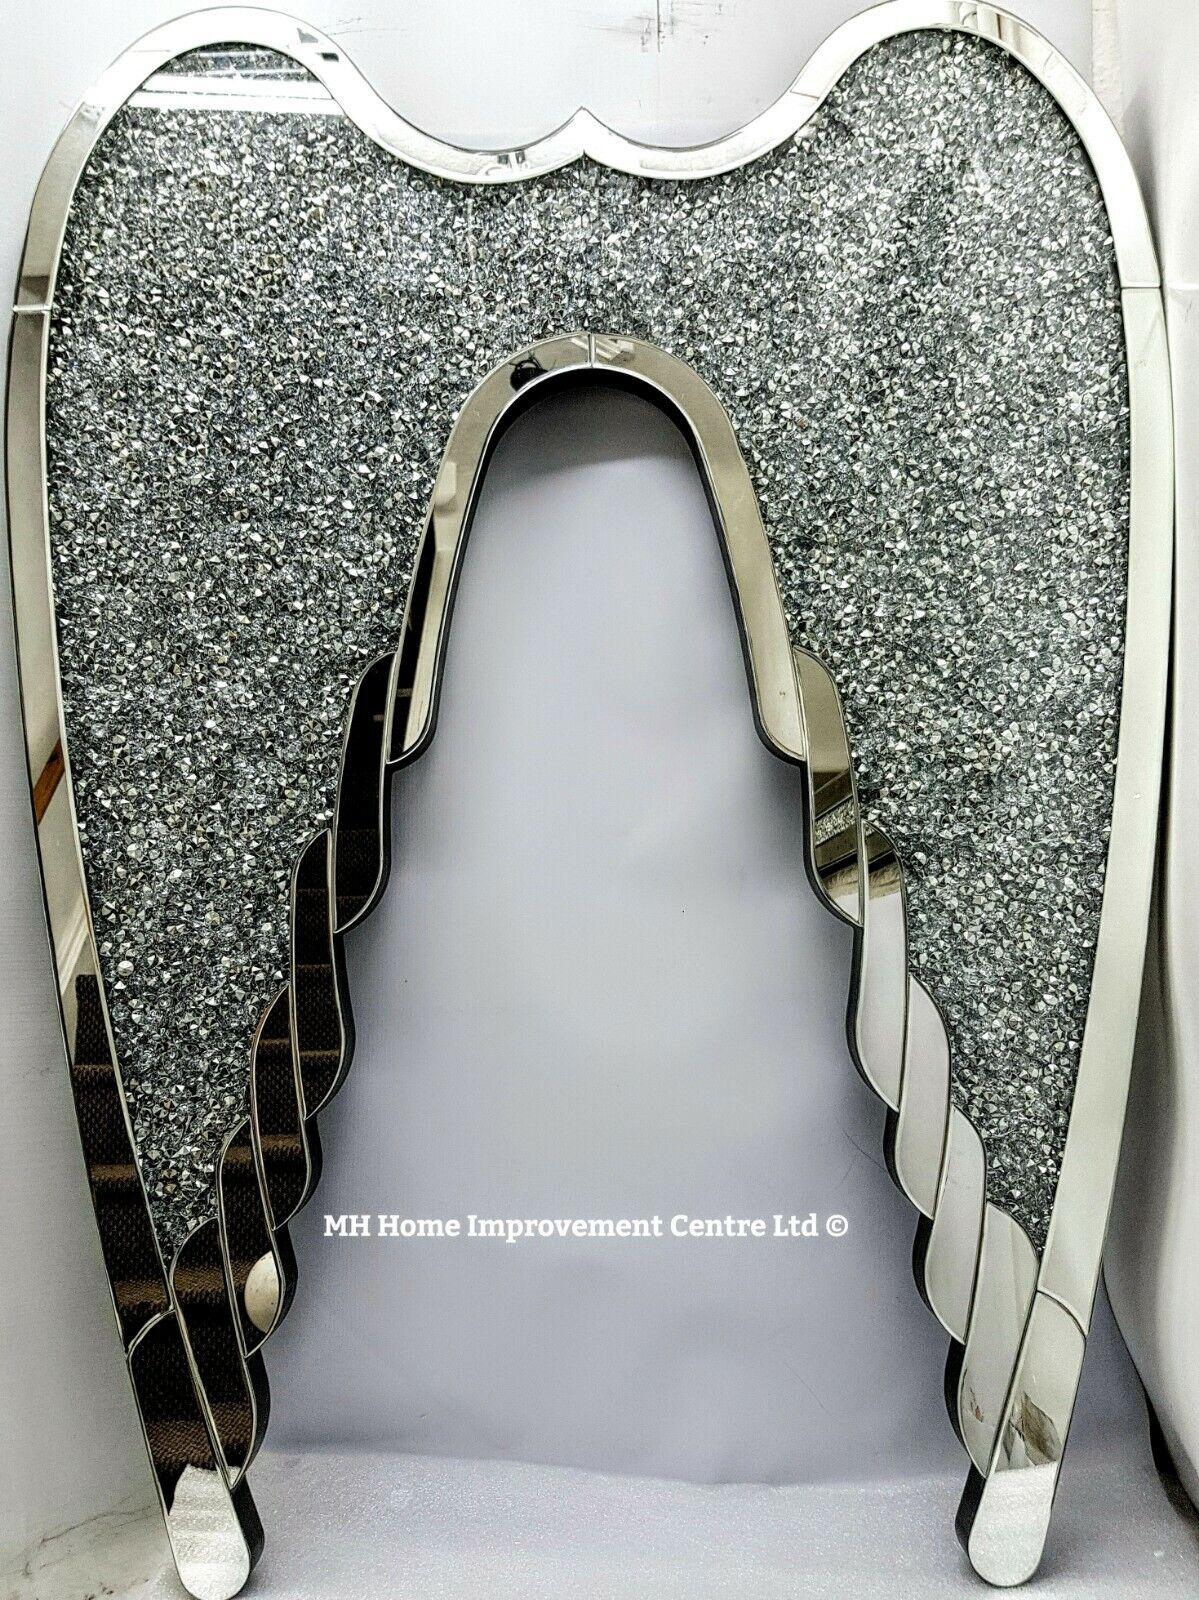 Diamant Zerdrücken Kristall Engel Flügel Glitzer Abgeschrägt Silber Spiegel Wand